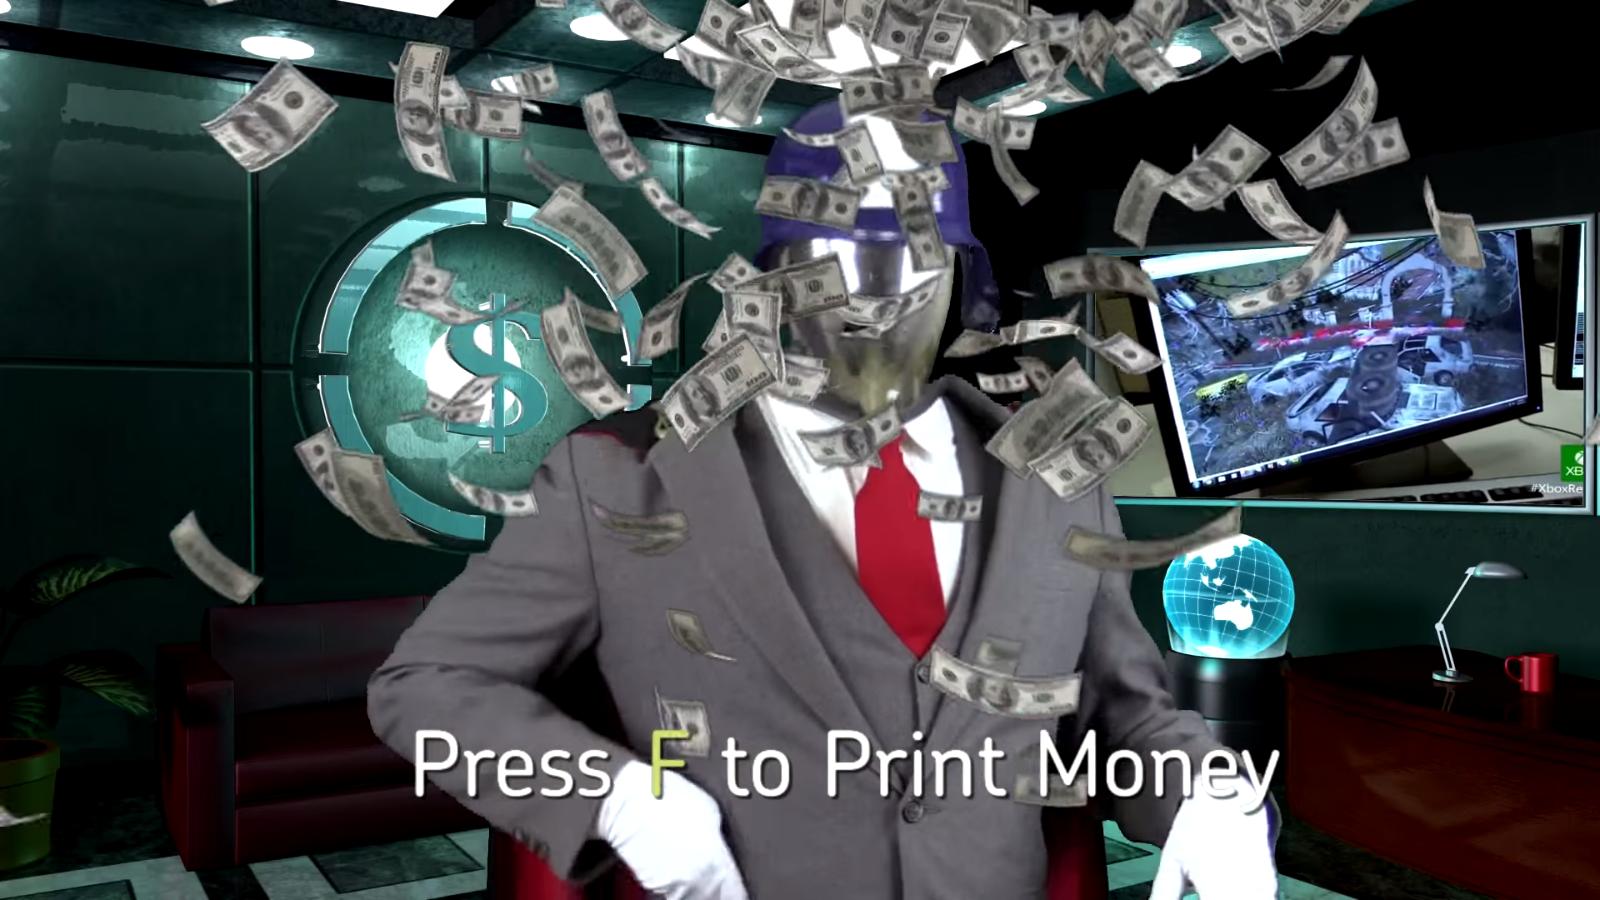 press f to print money